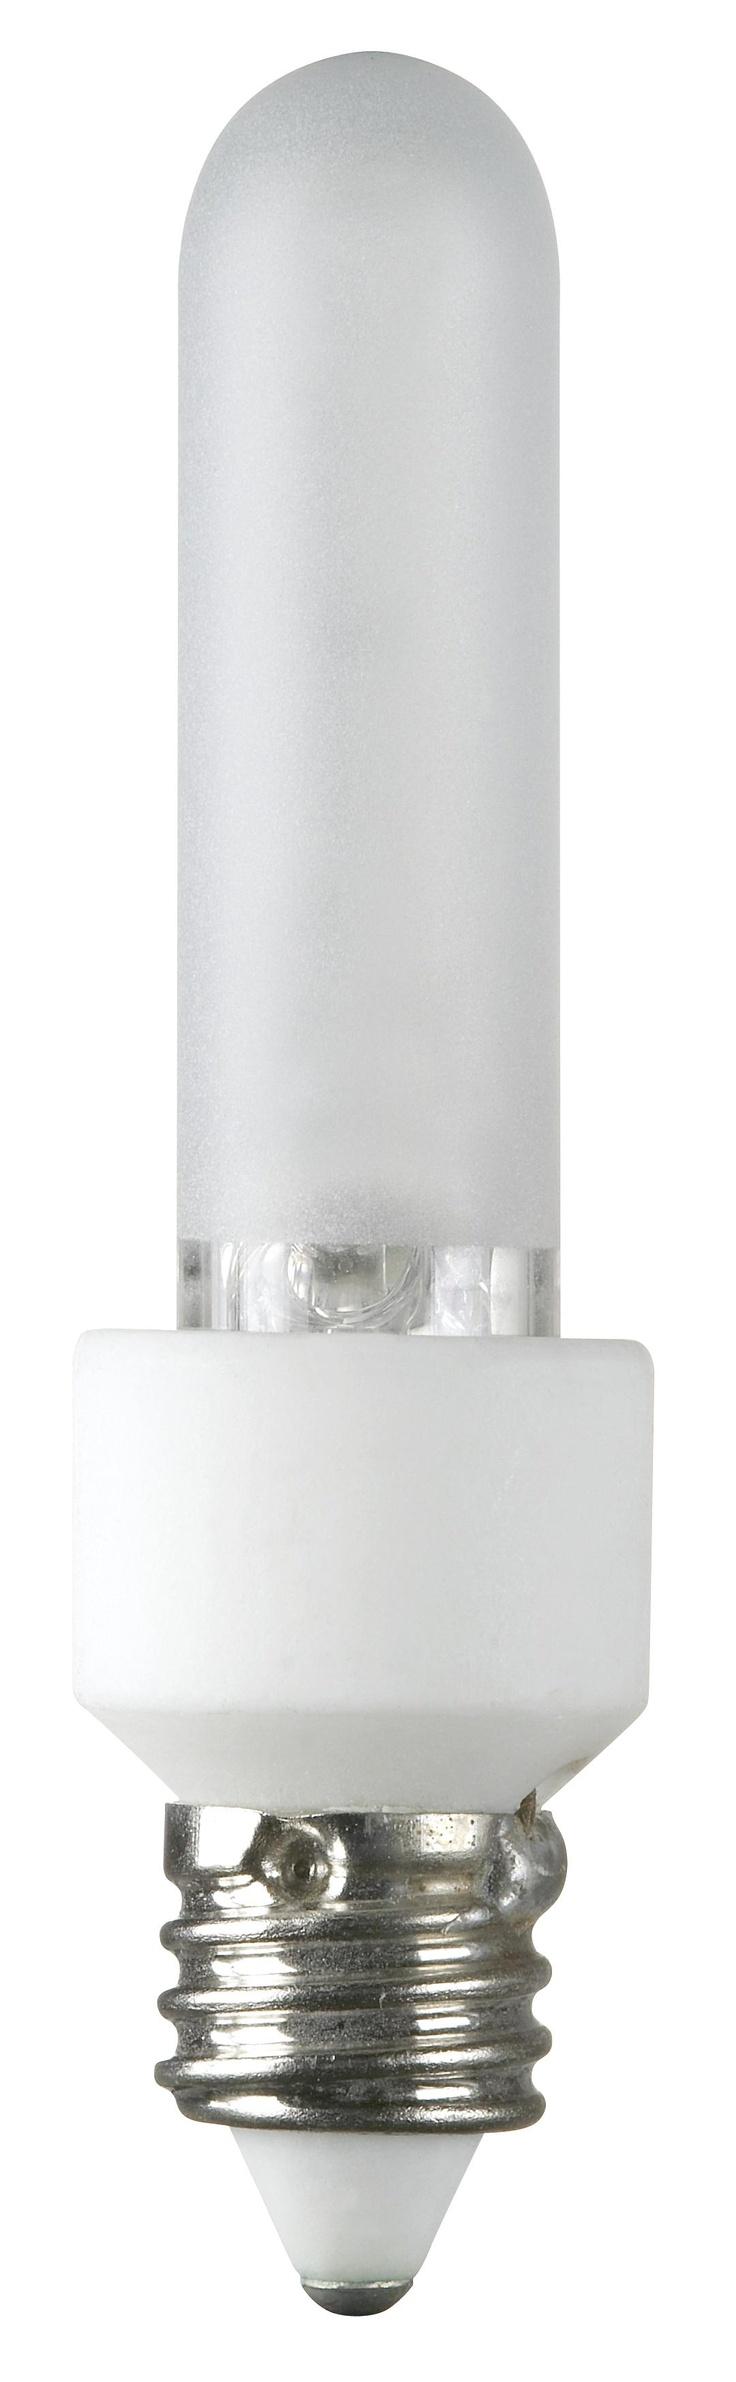 60-Watts Krypton/Xenon Frosted Mini-Can Light Bulb -